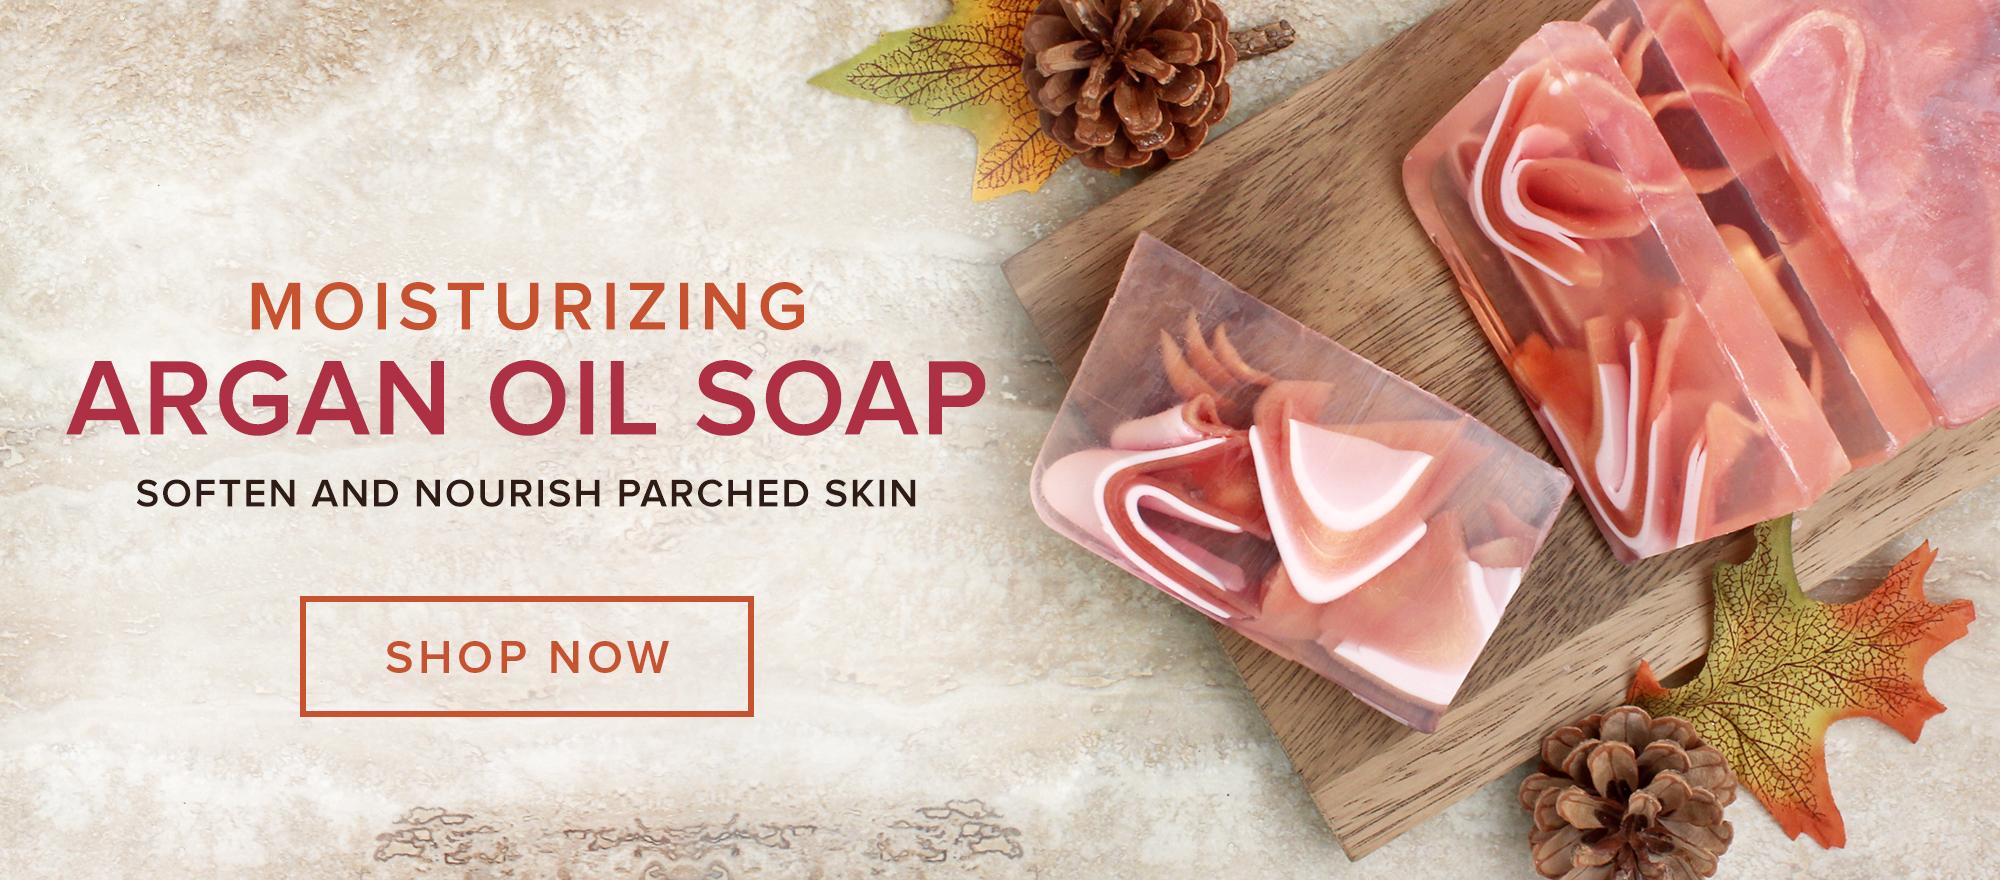 Moisturizing Argan Oil Soap